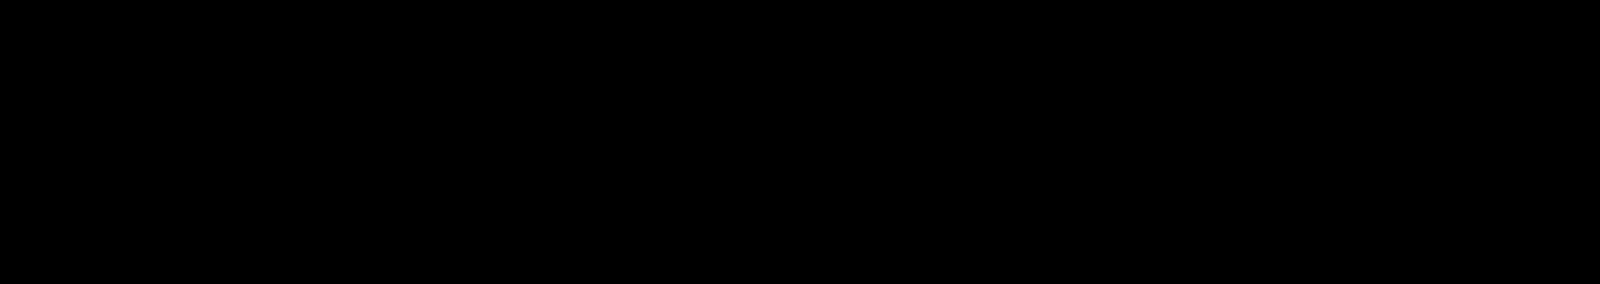 Austel - logo